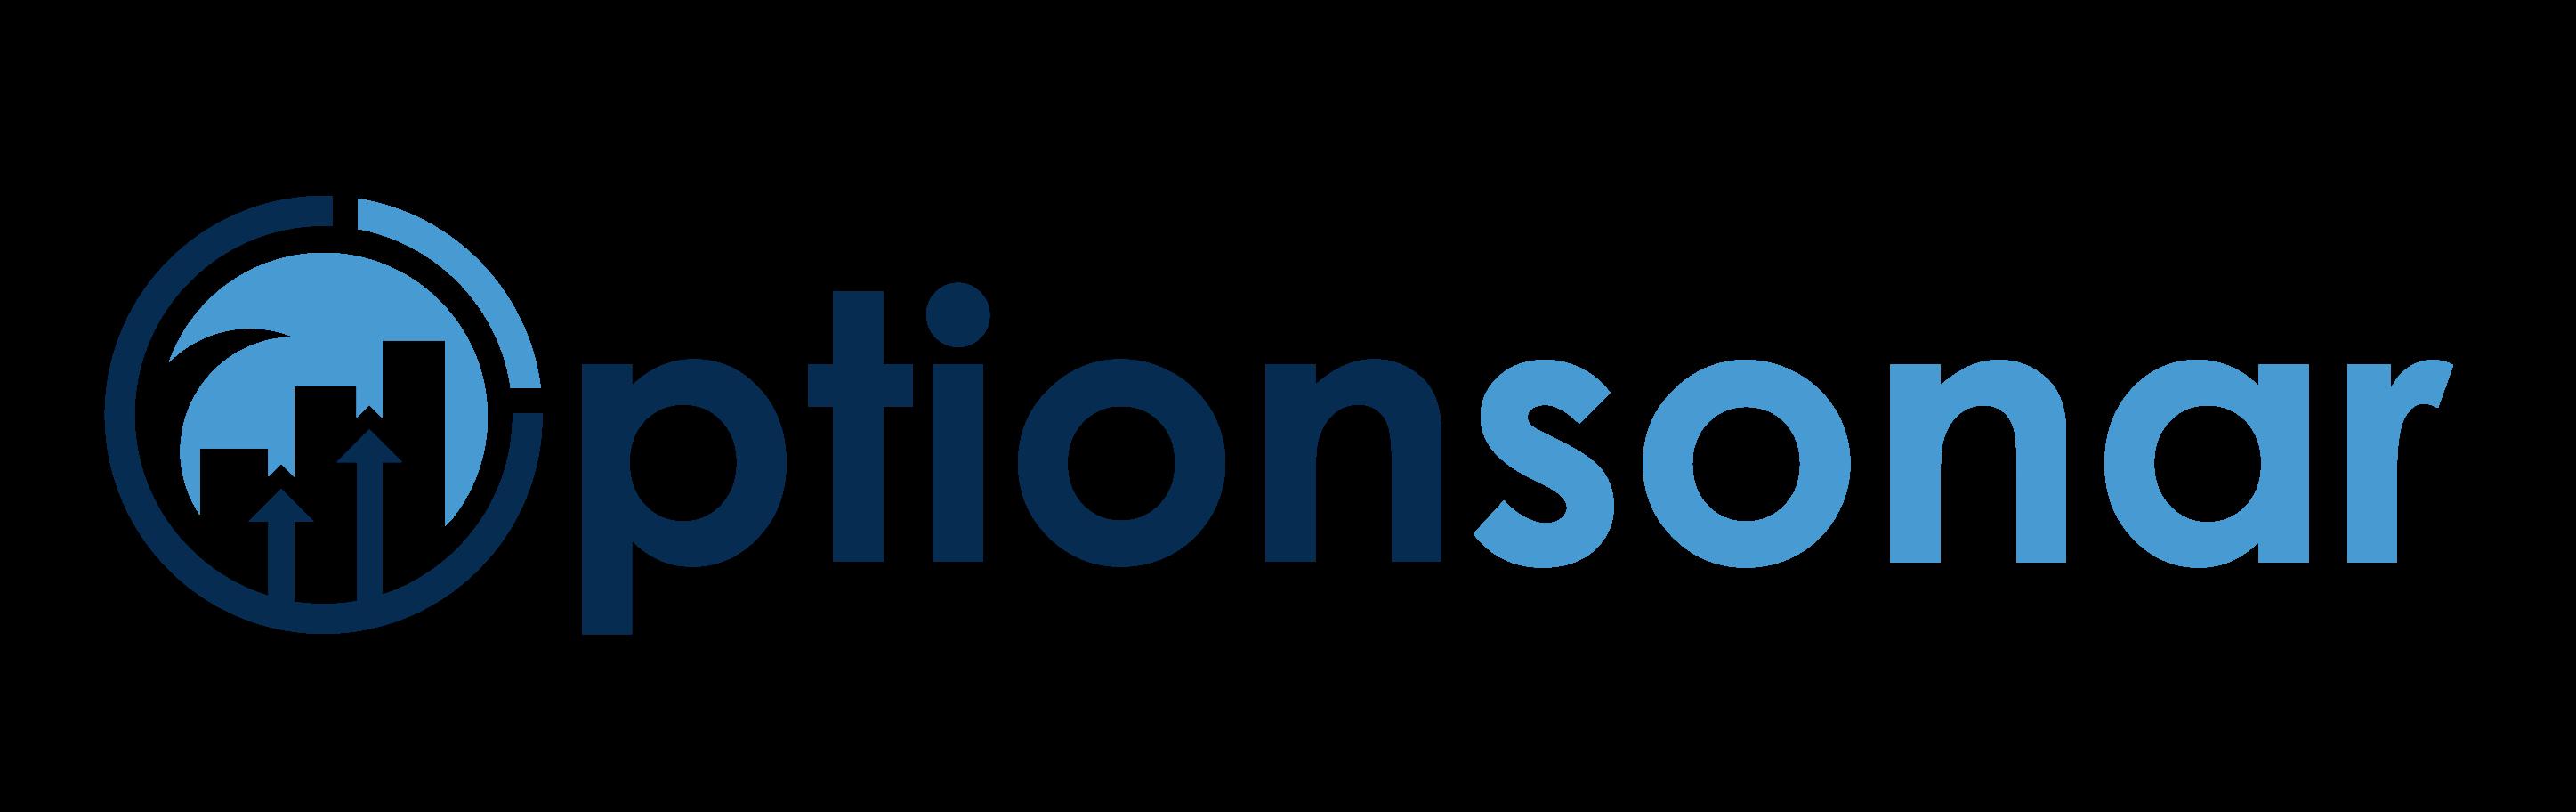 Optionsonar Logo